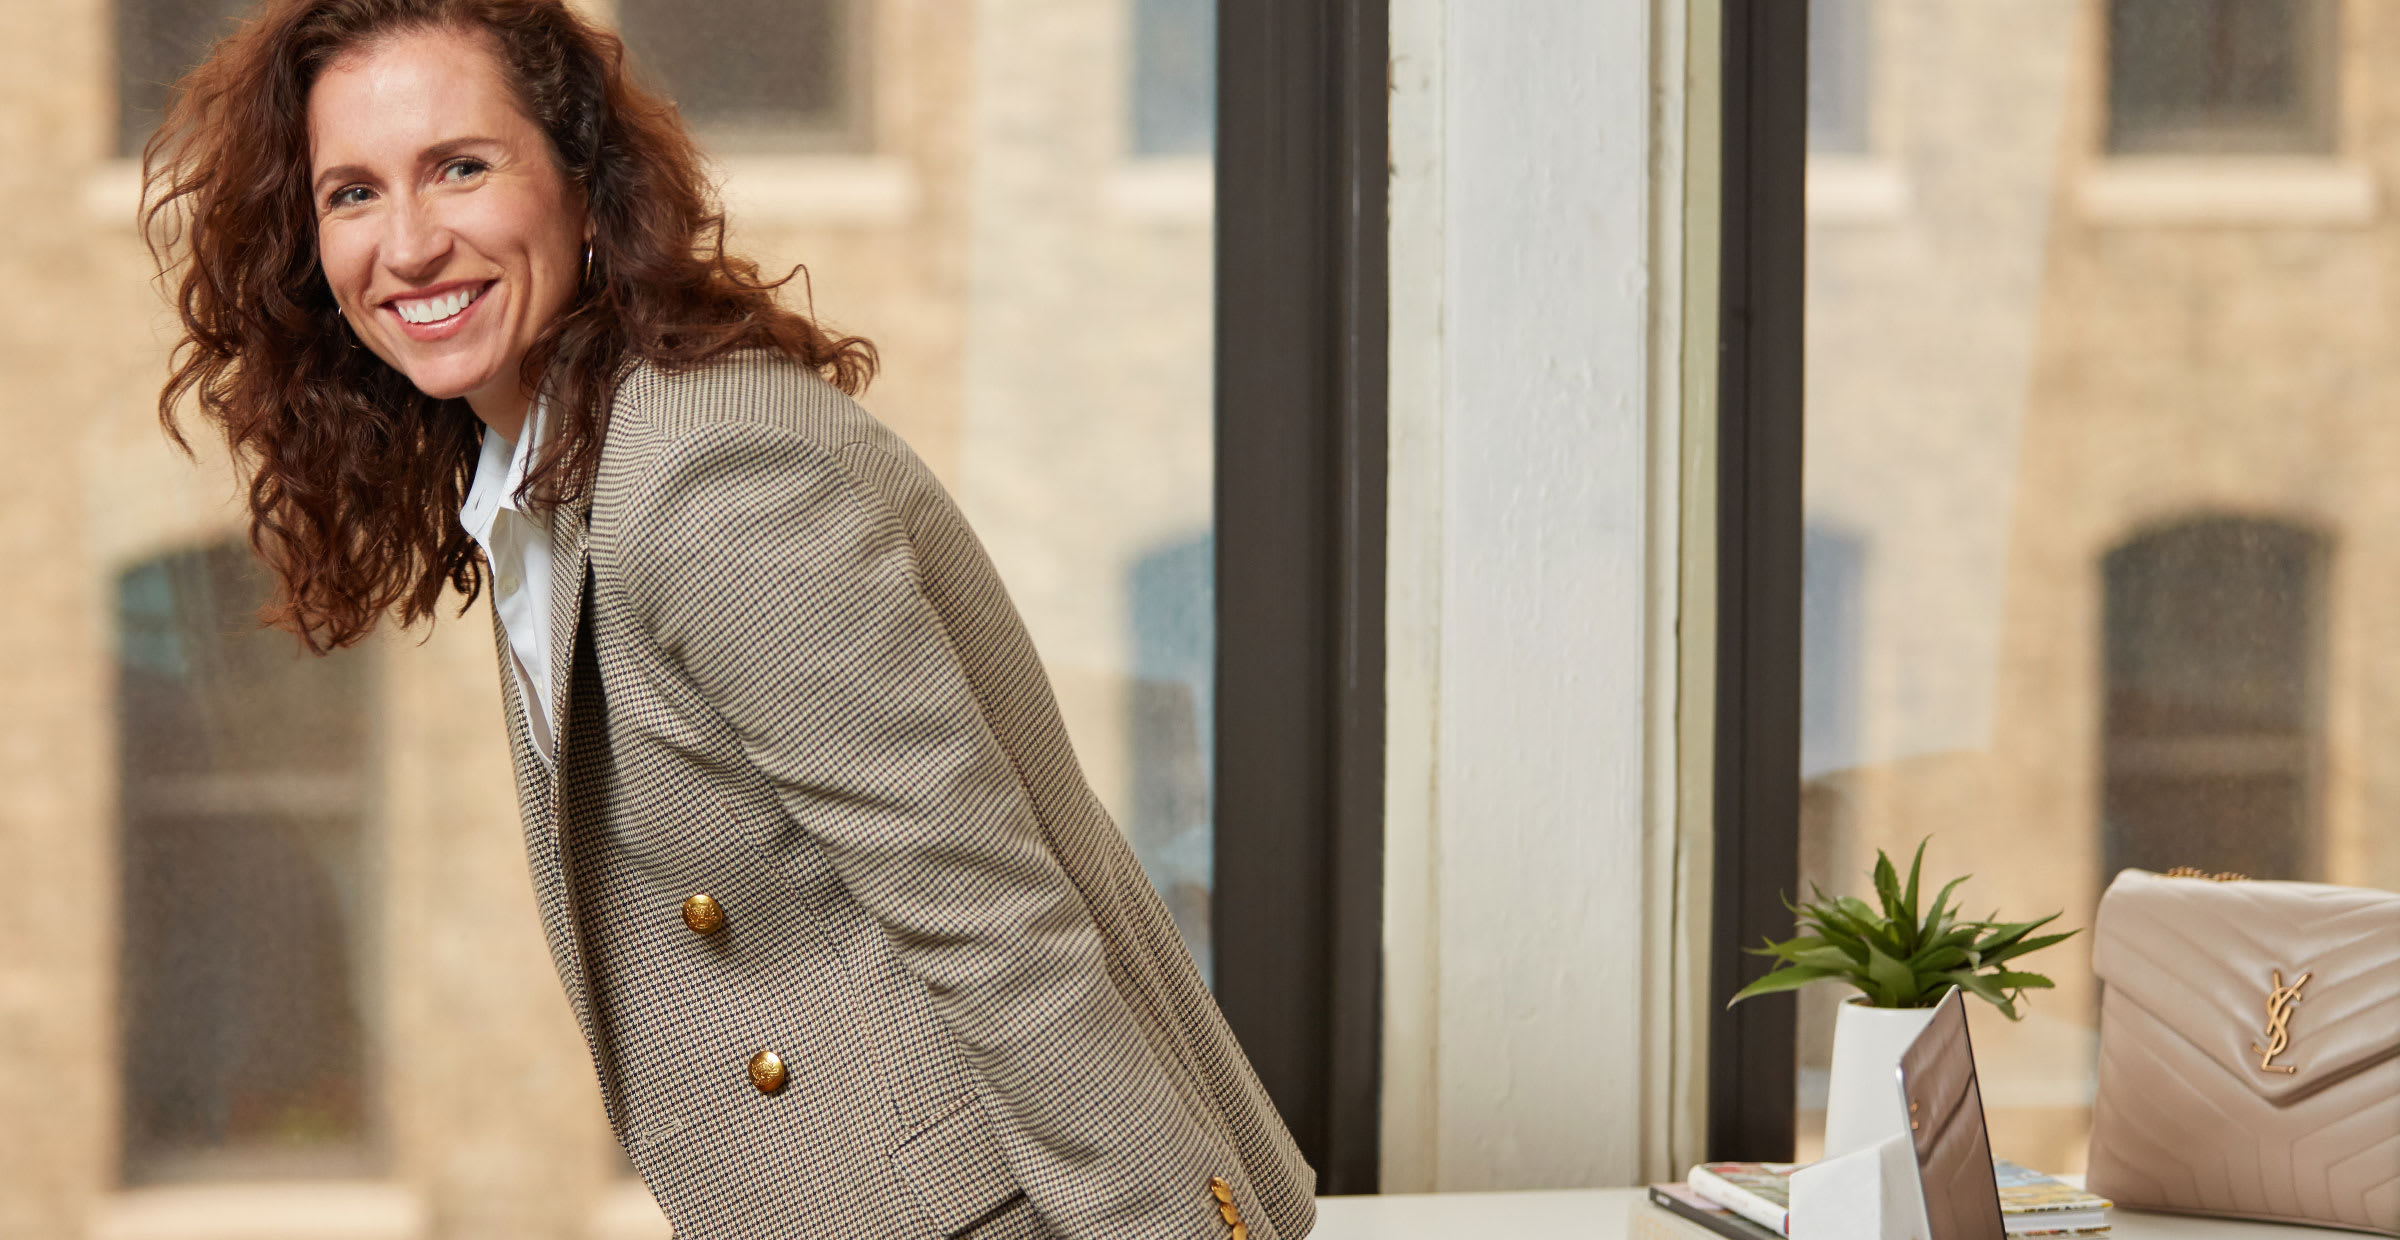 business woman in houndstooth blazer